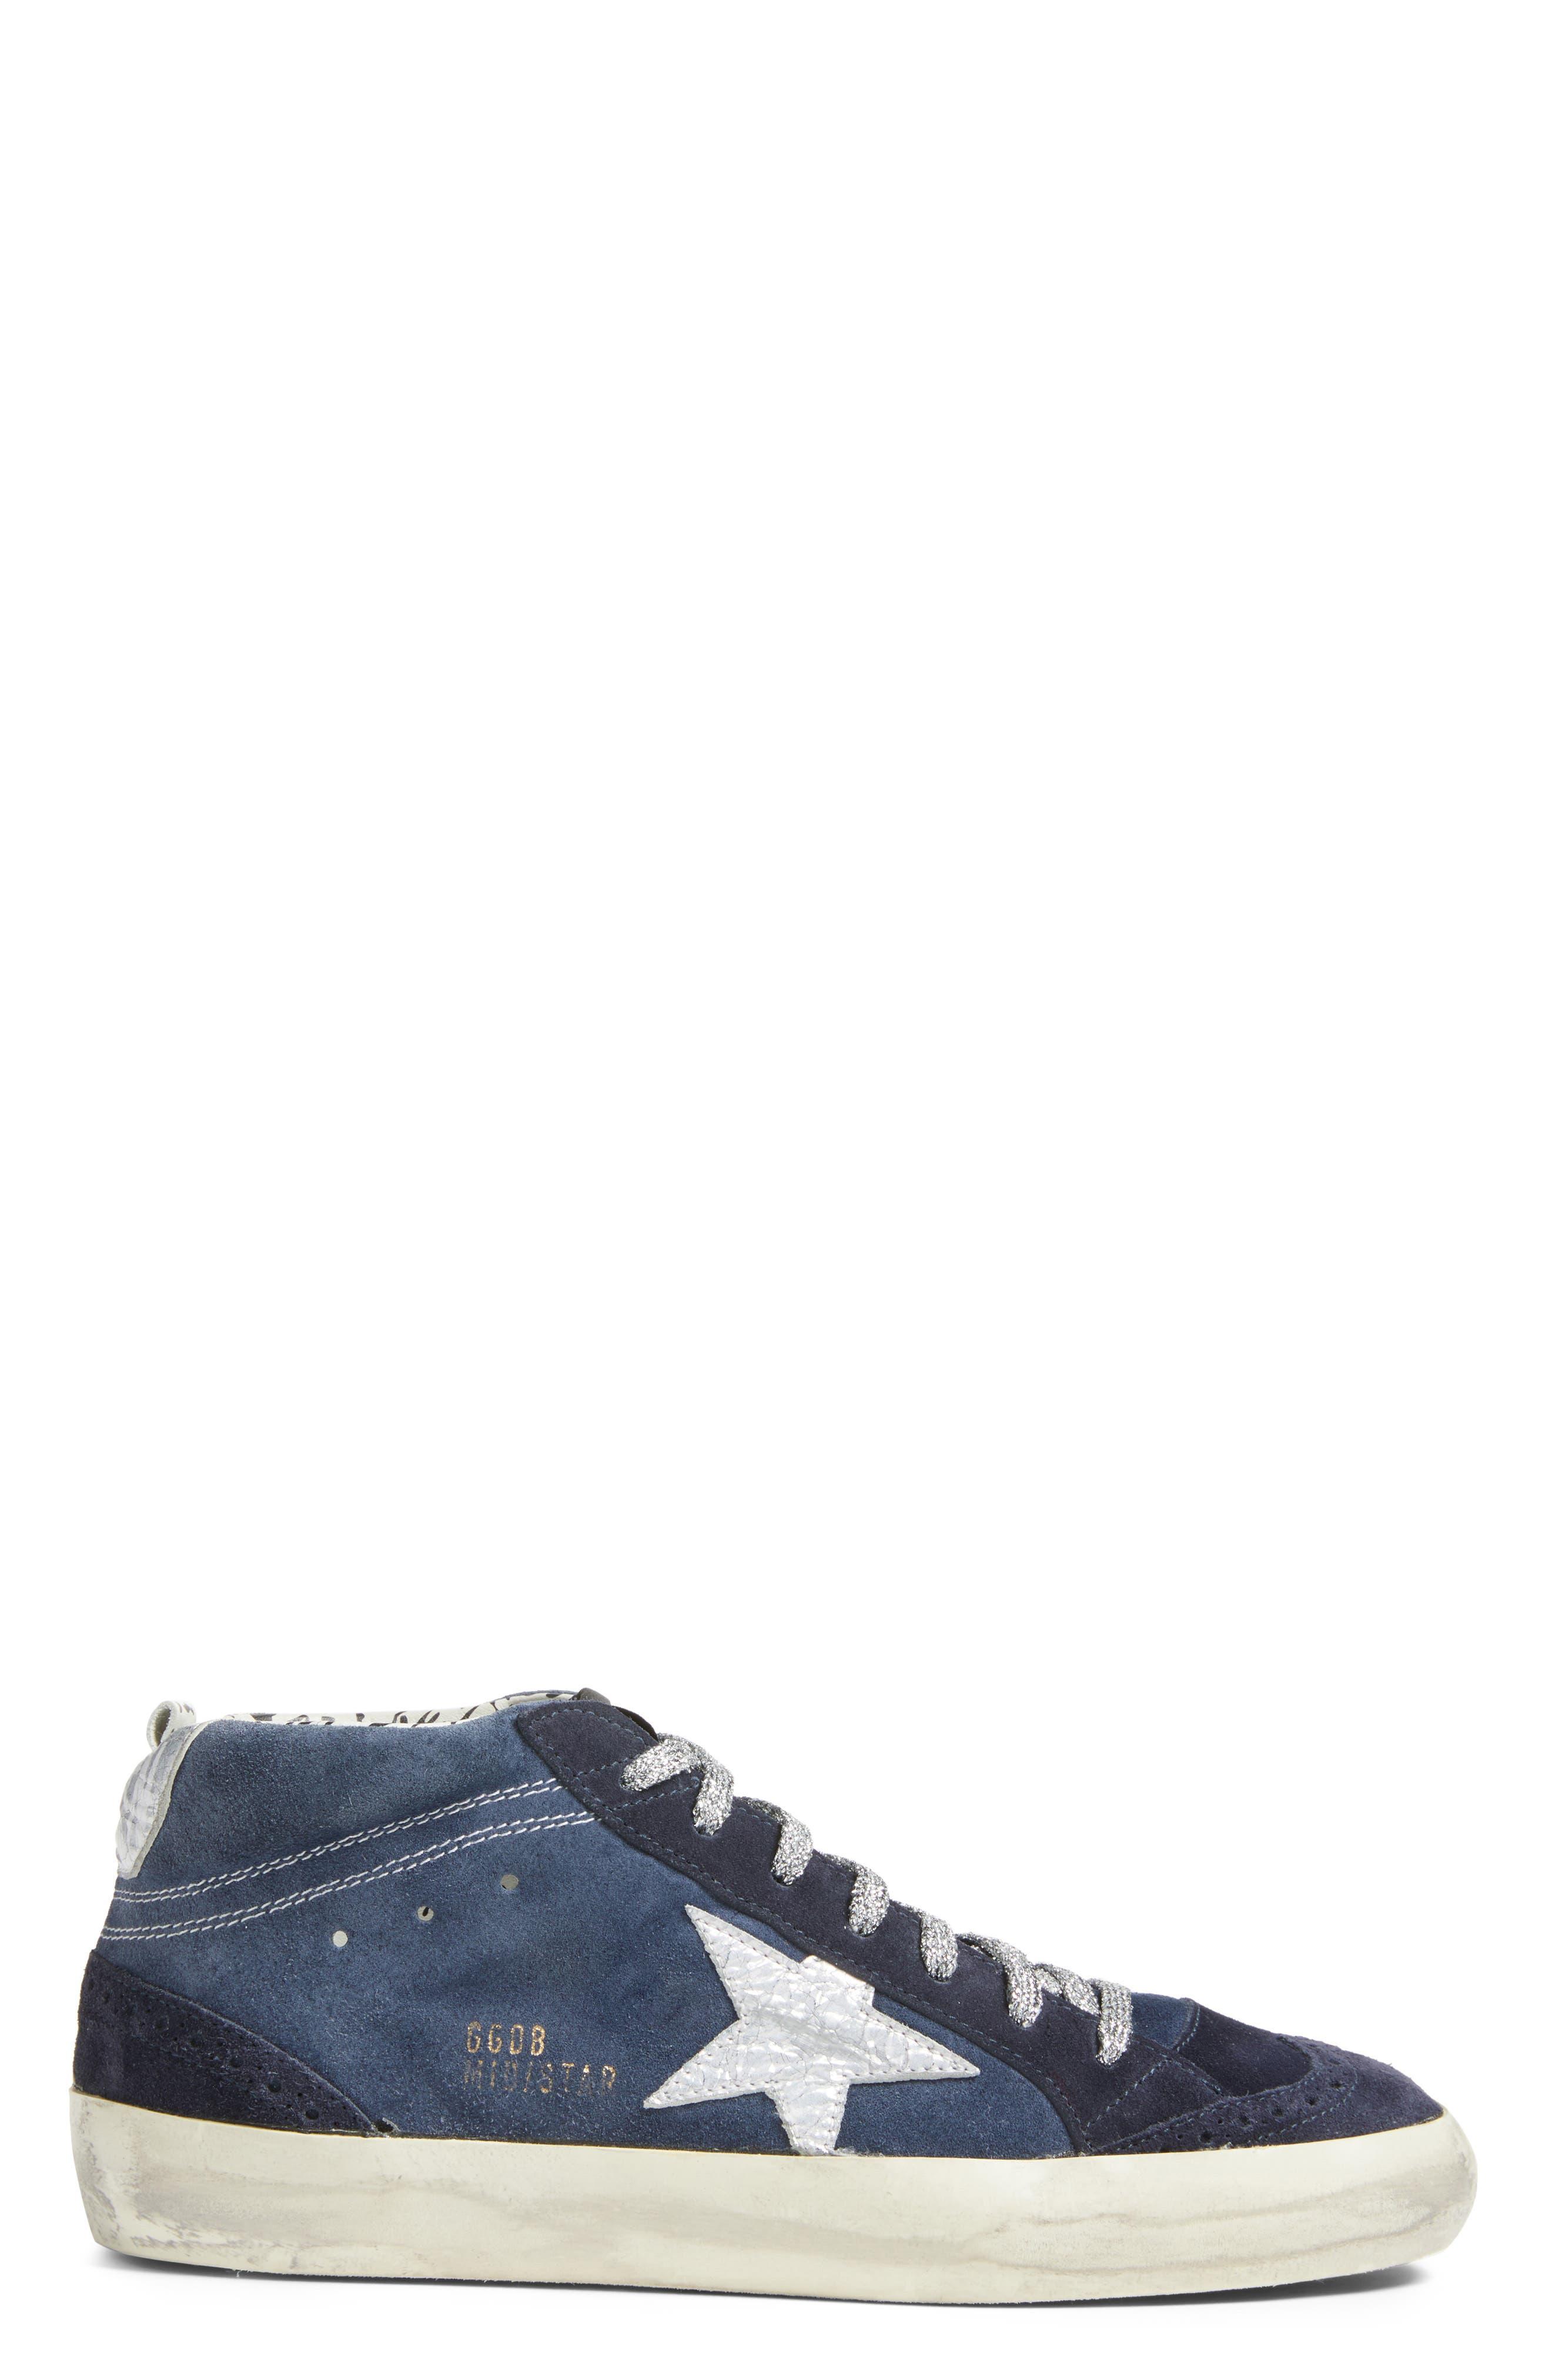 Star Mid Top Sneaker,                             Alternate thumbnail 3, color,                             401